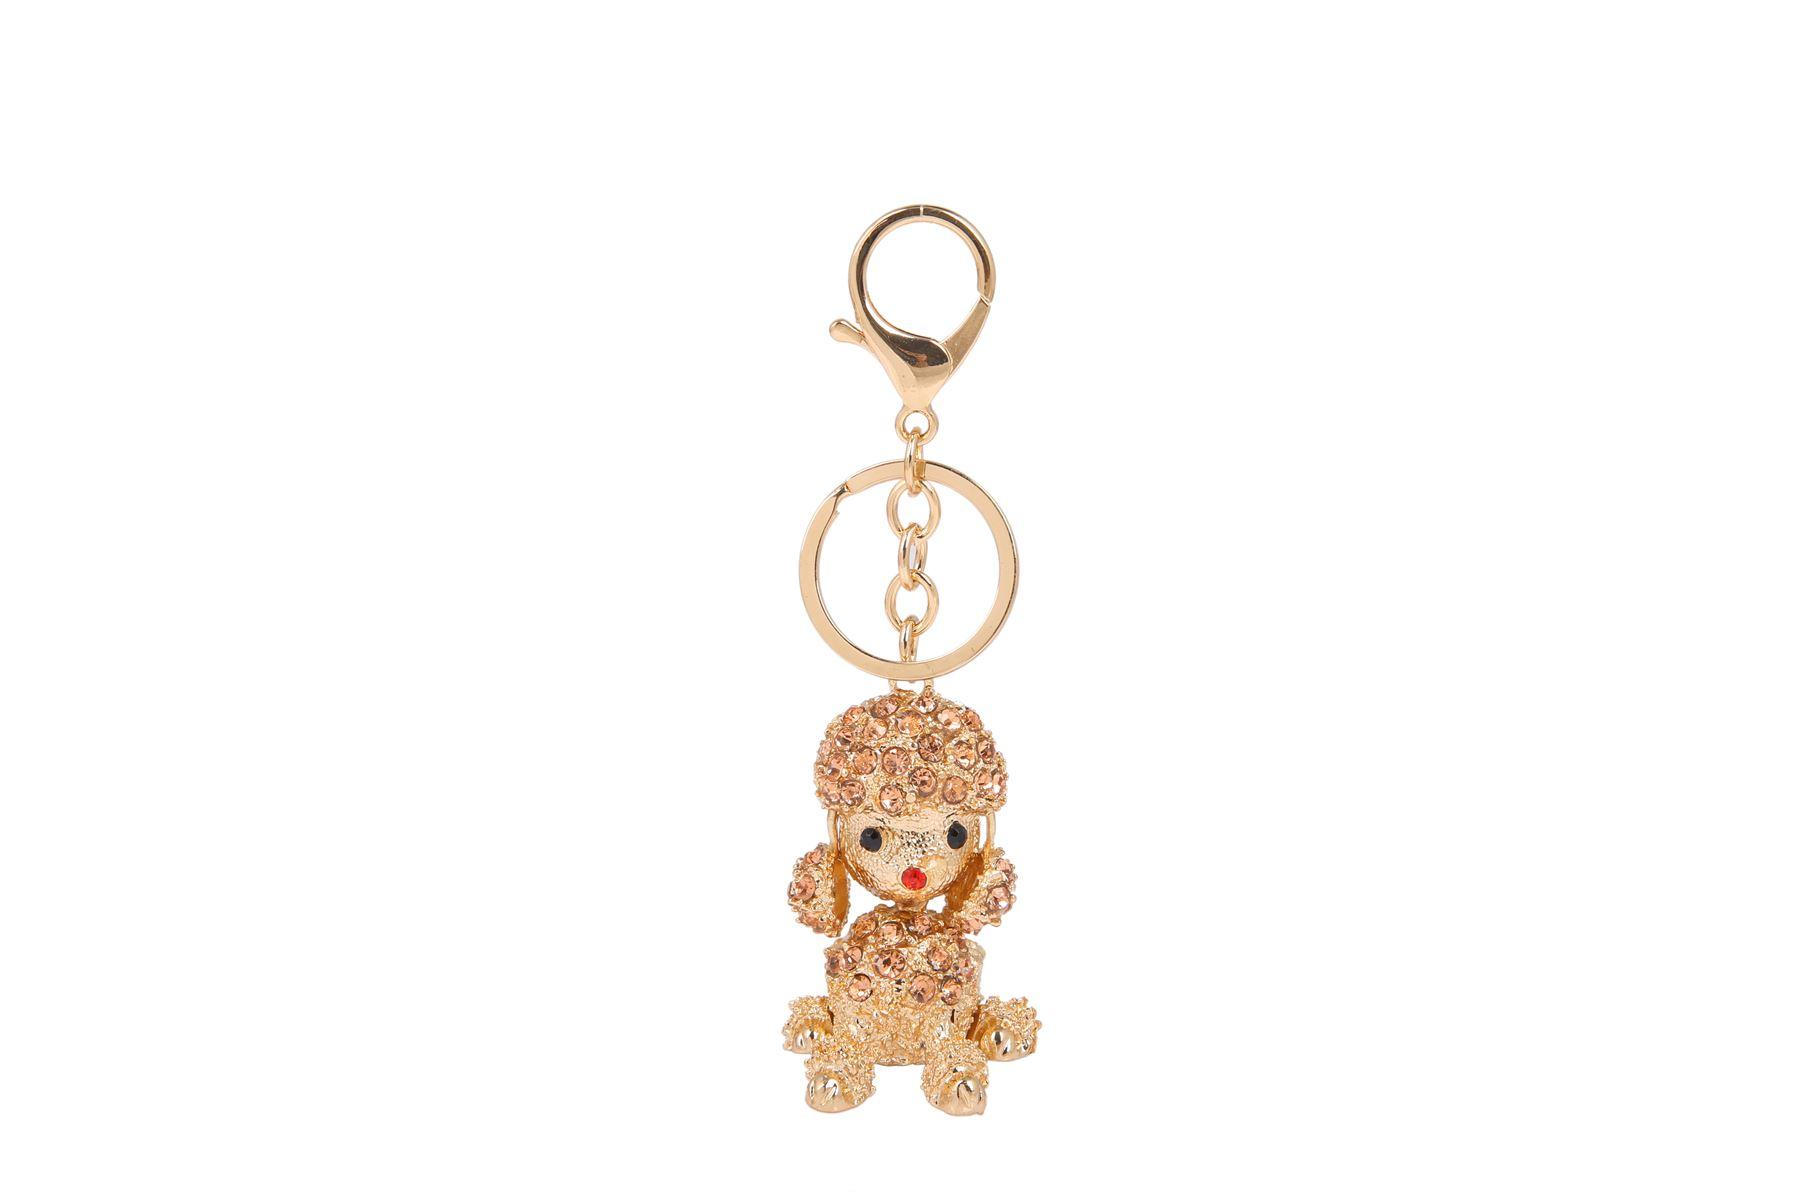 Key-Ring-Bag-Charm-Anime-Character-Rhinestone-Crystal-CZ-Keyring-Keychain-Gift thumbnail 5